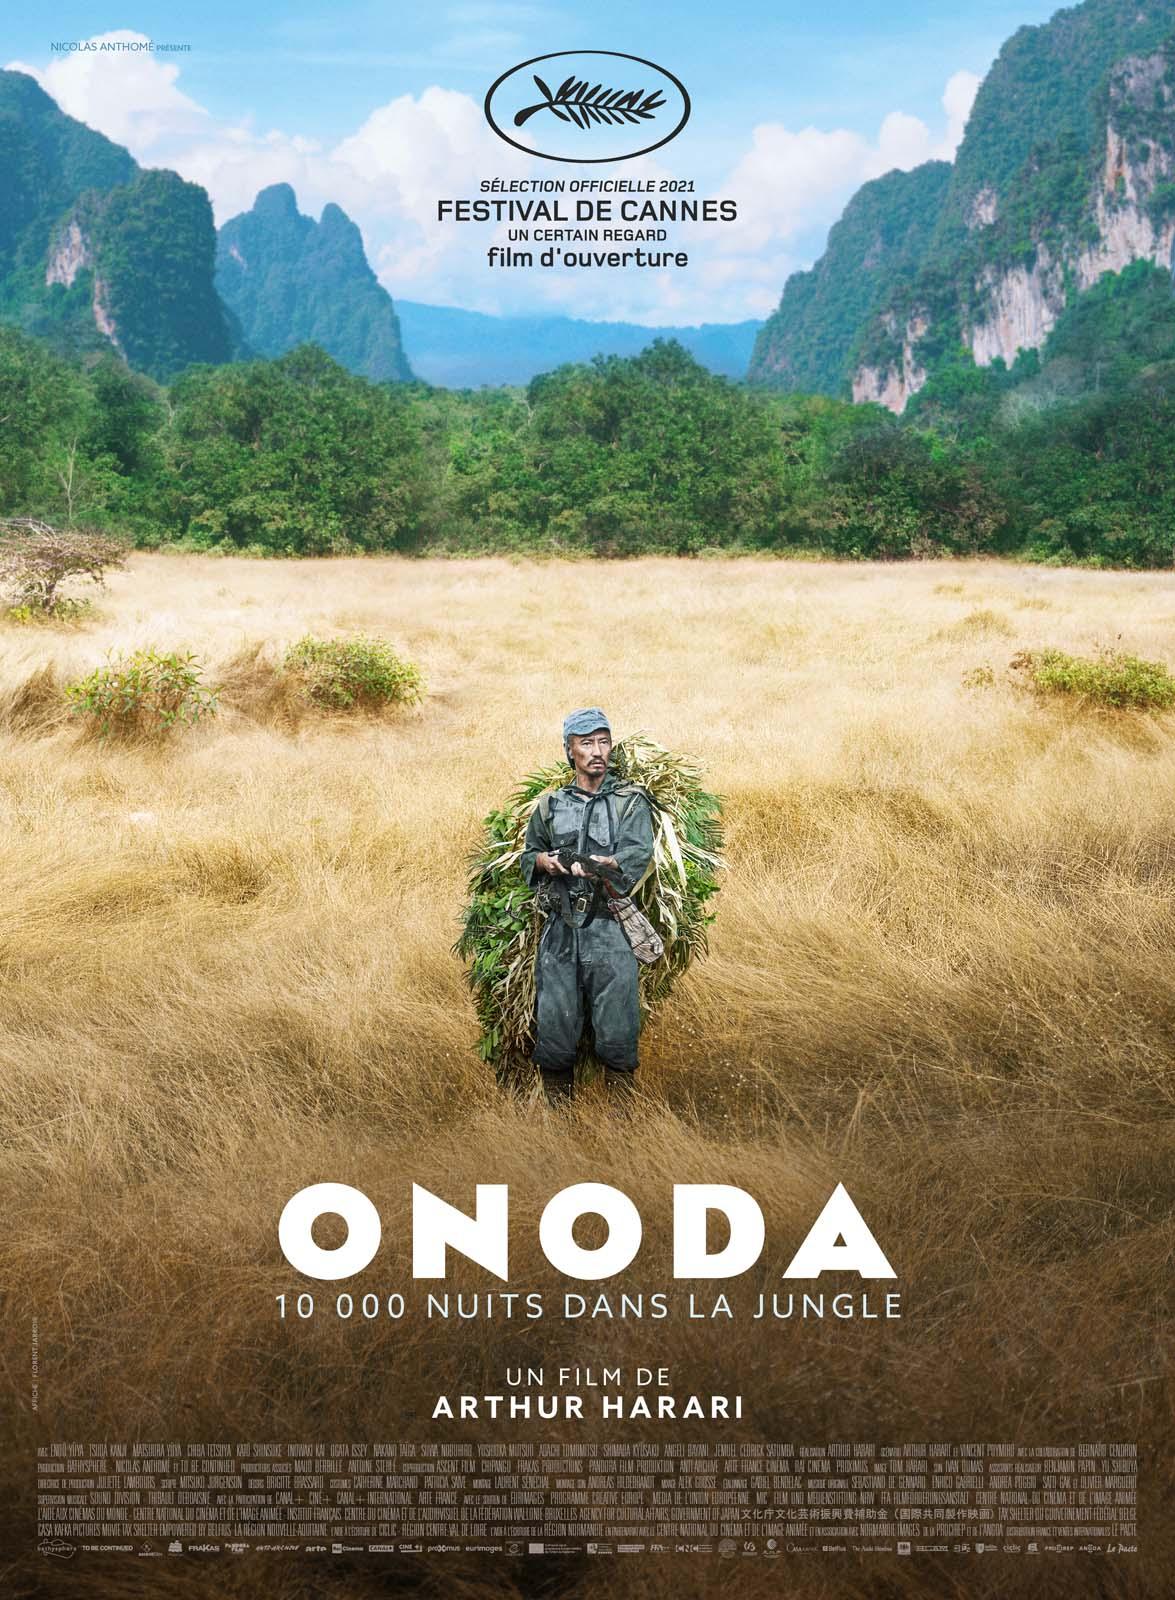 Onoda - 10 000 nuits dans la jungle streaming